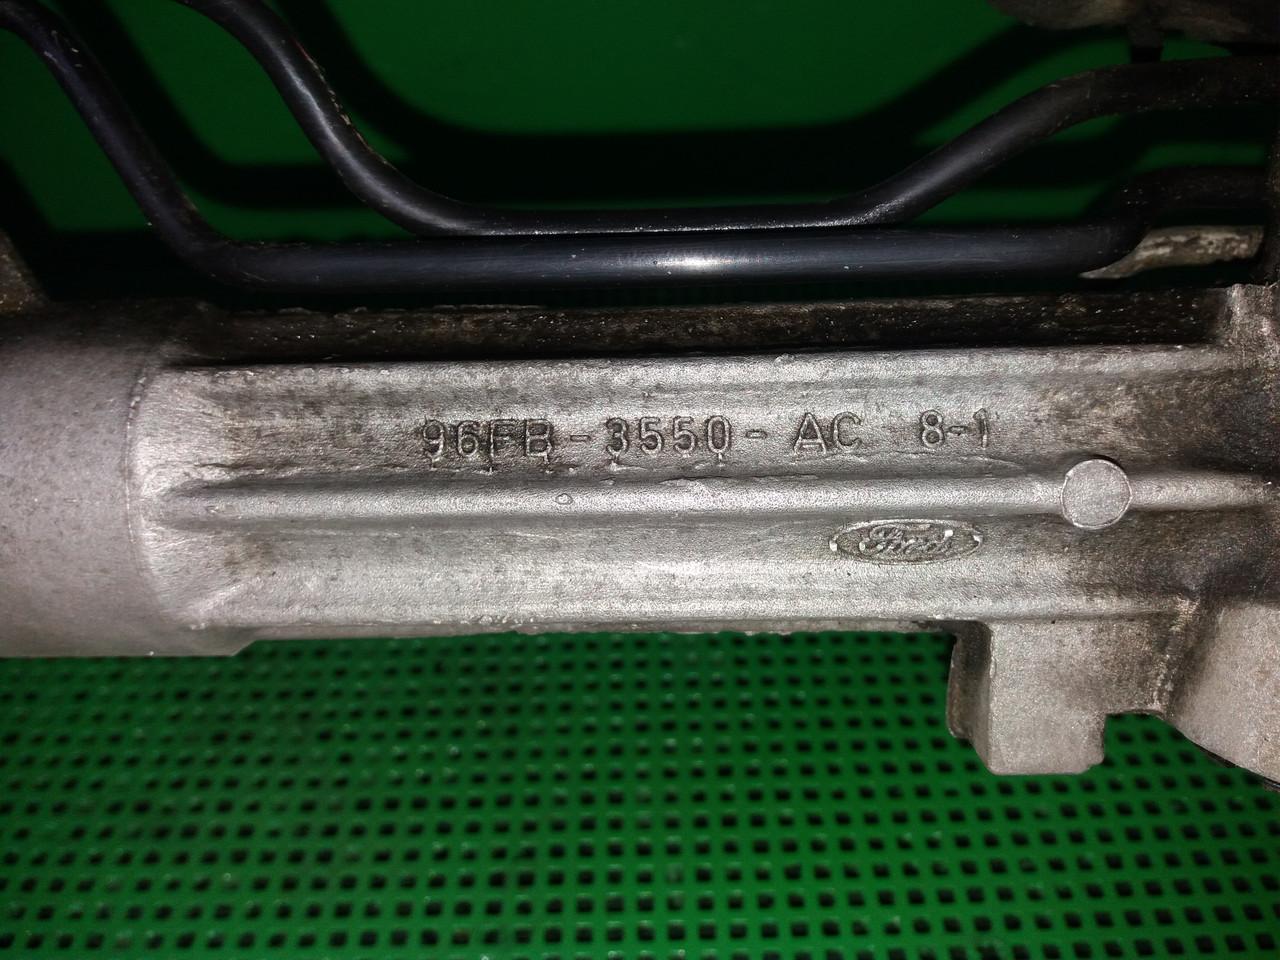 96fb-3550-ac Рульова рейка для Ford Fiesta MK4 Courier